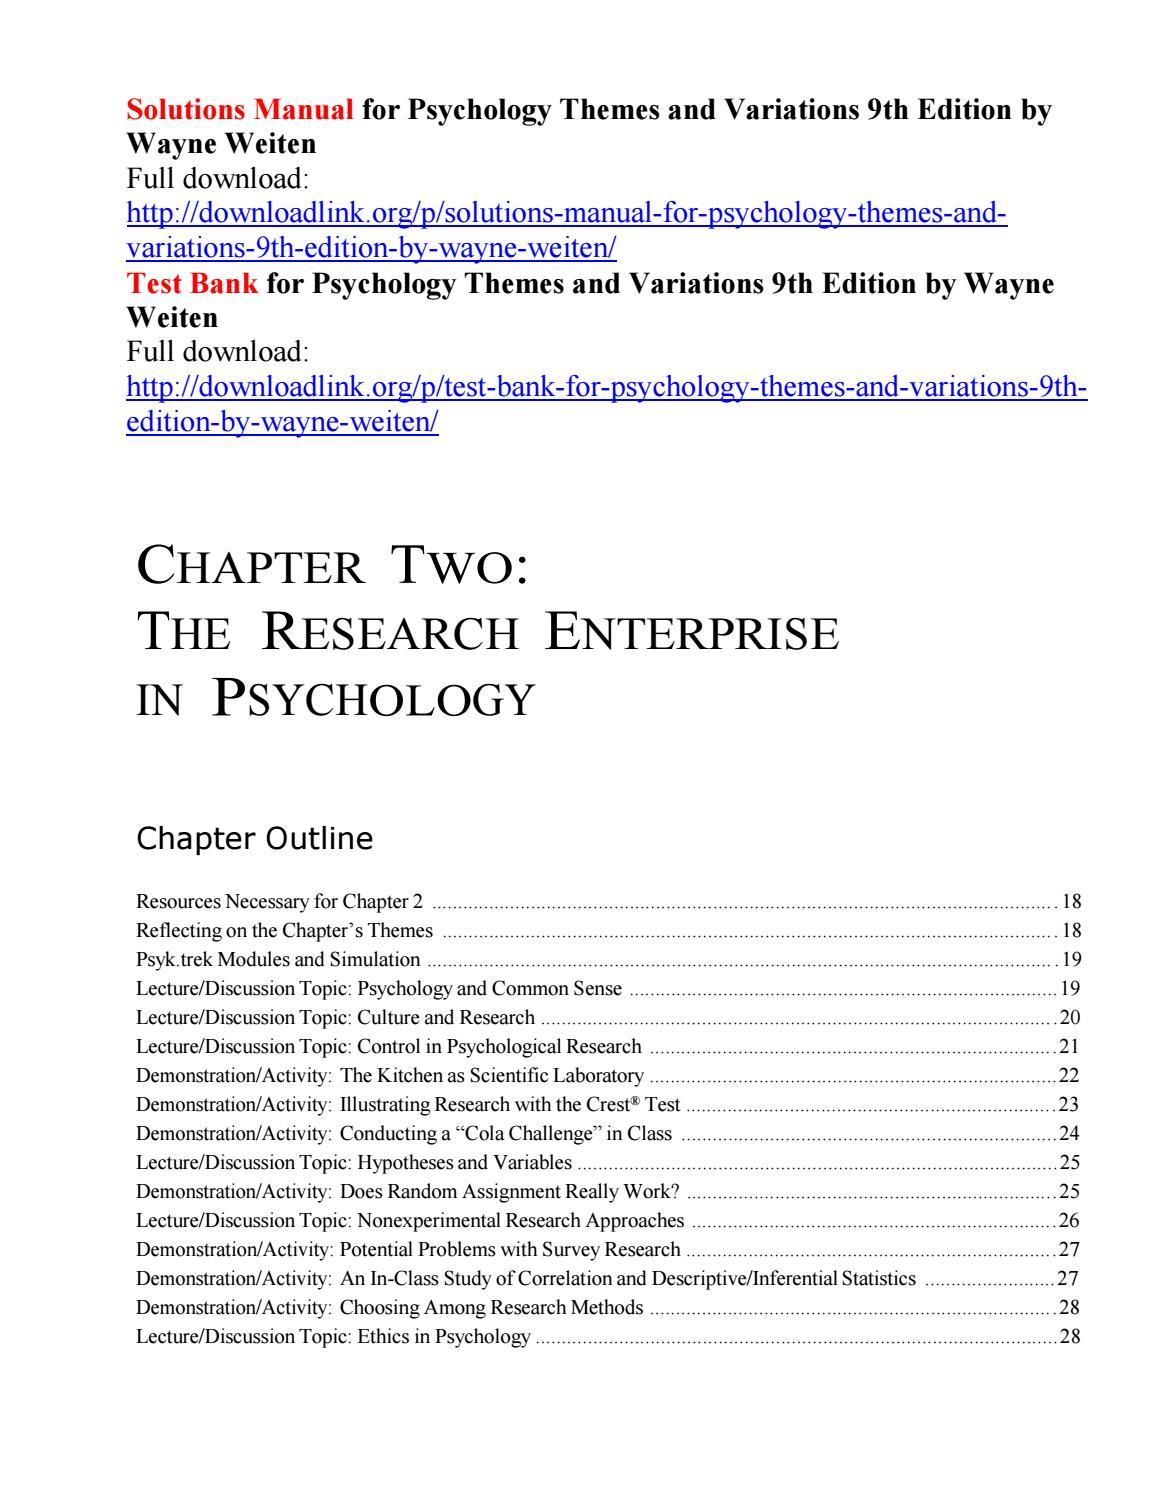 Social Psychology 9th Edition Pdf Free